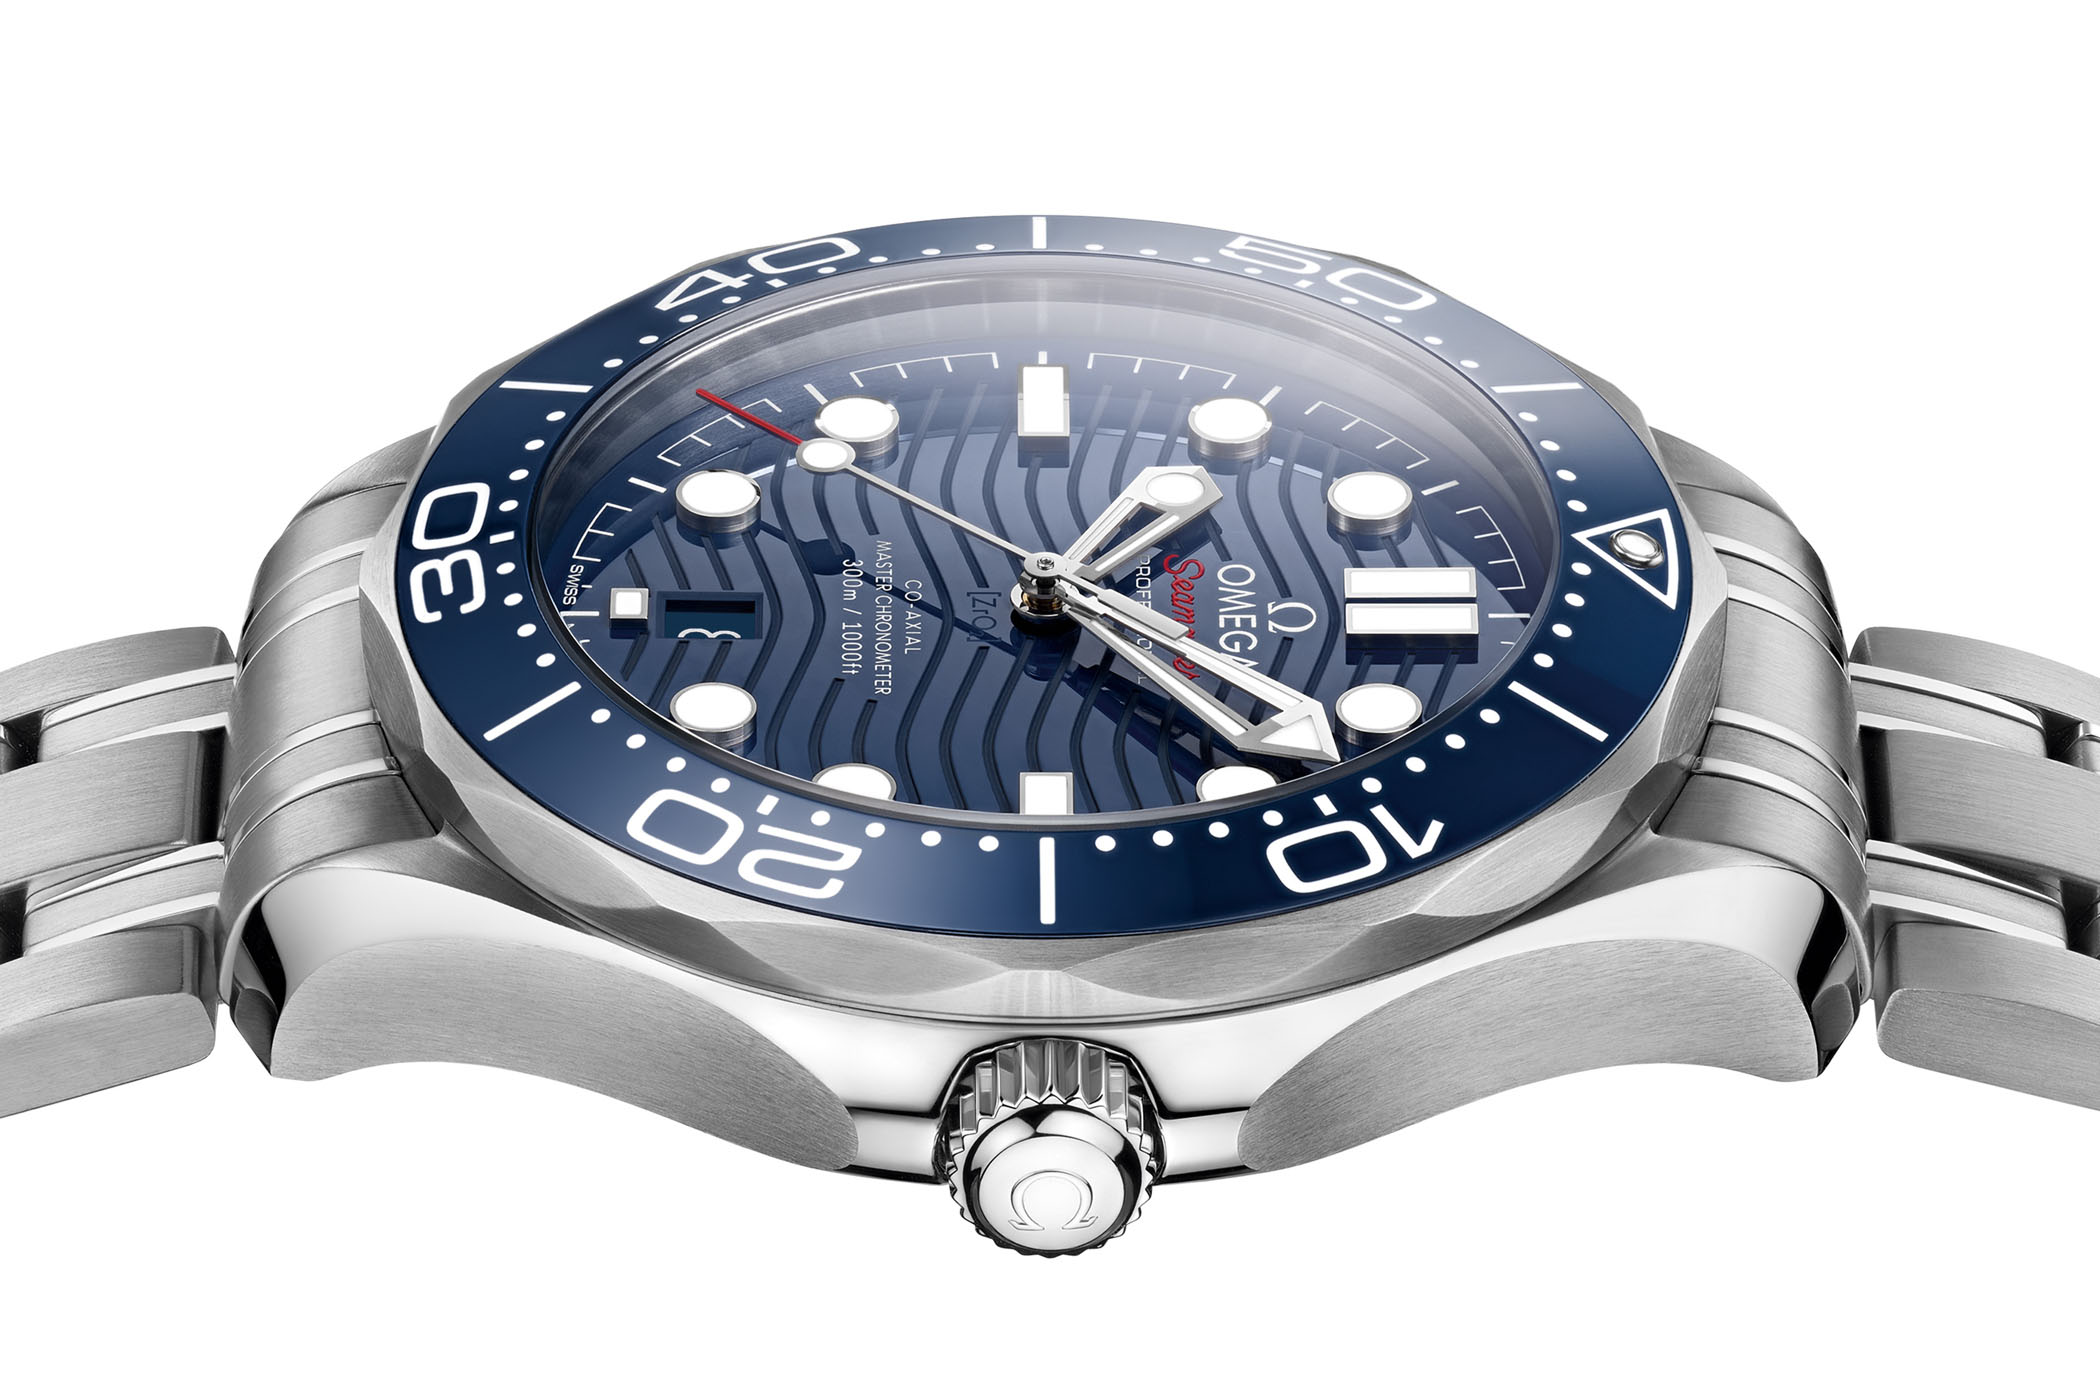 Omega Seamaster Diver 300M - Baselworld 2018